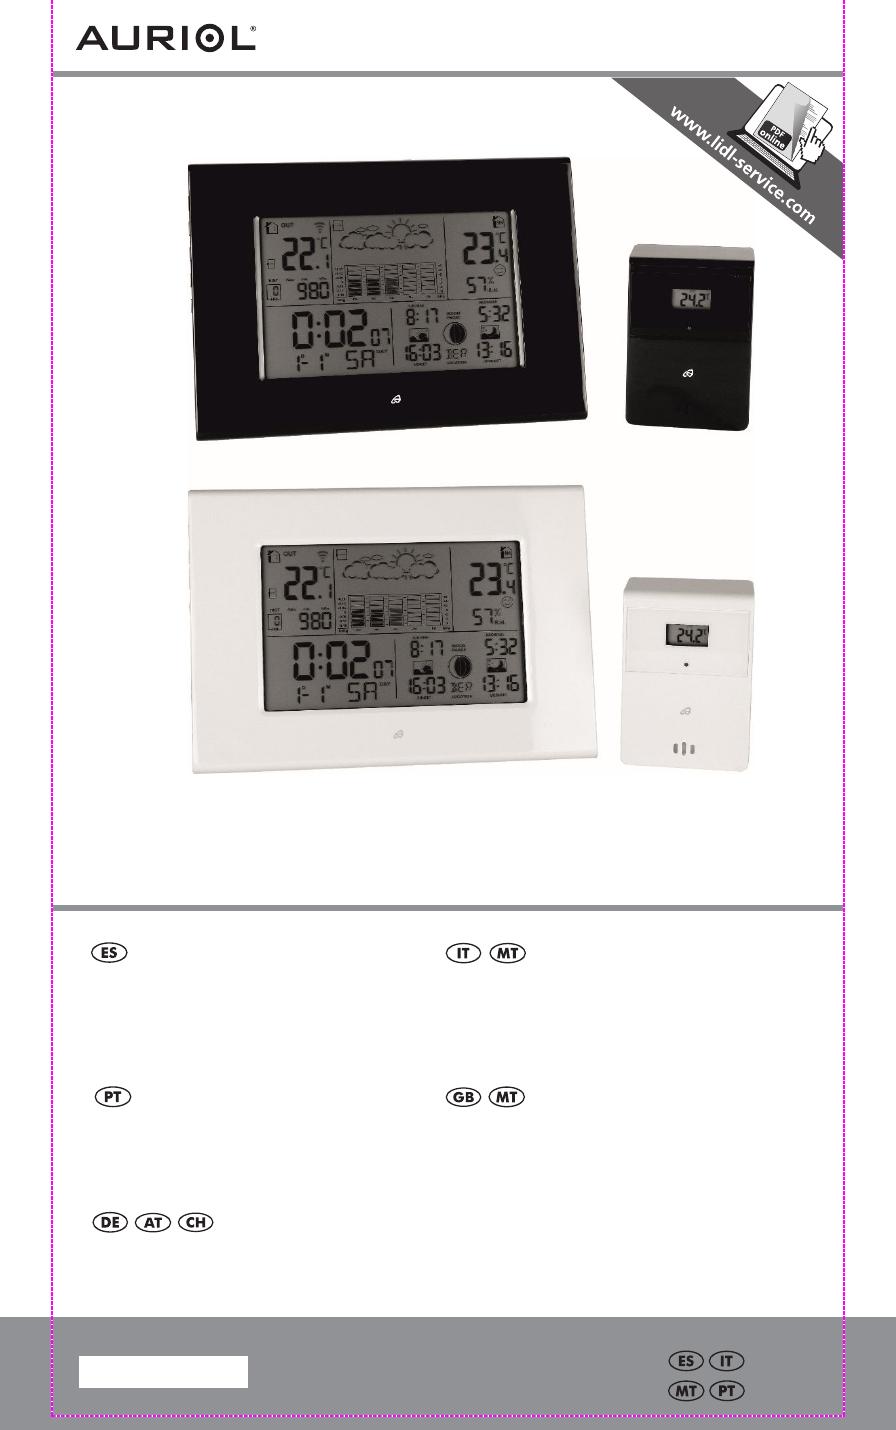 Auriol 4 Ld4437 Manual